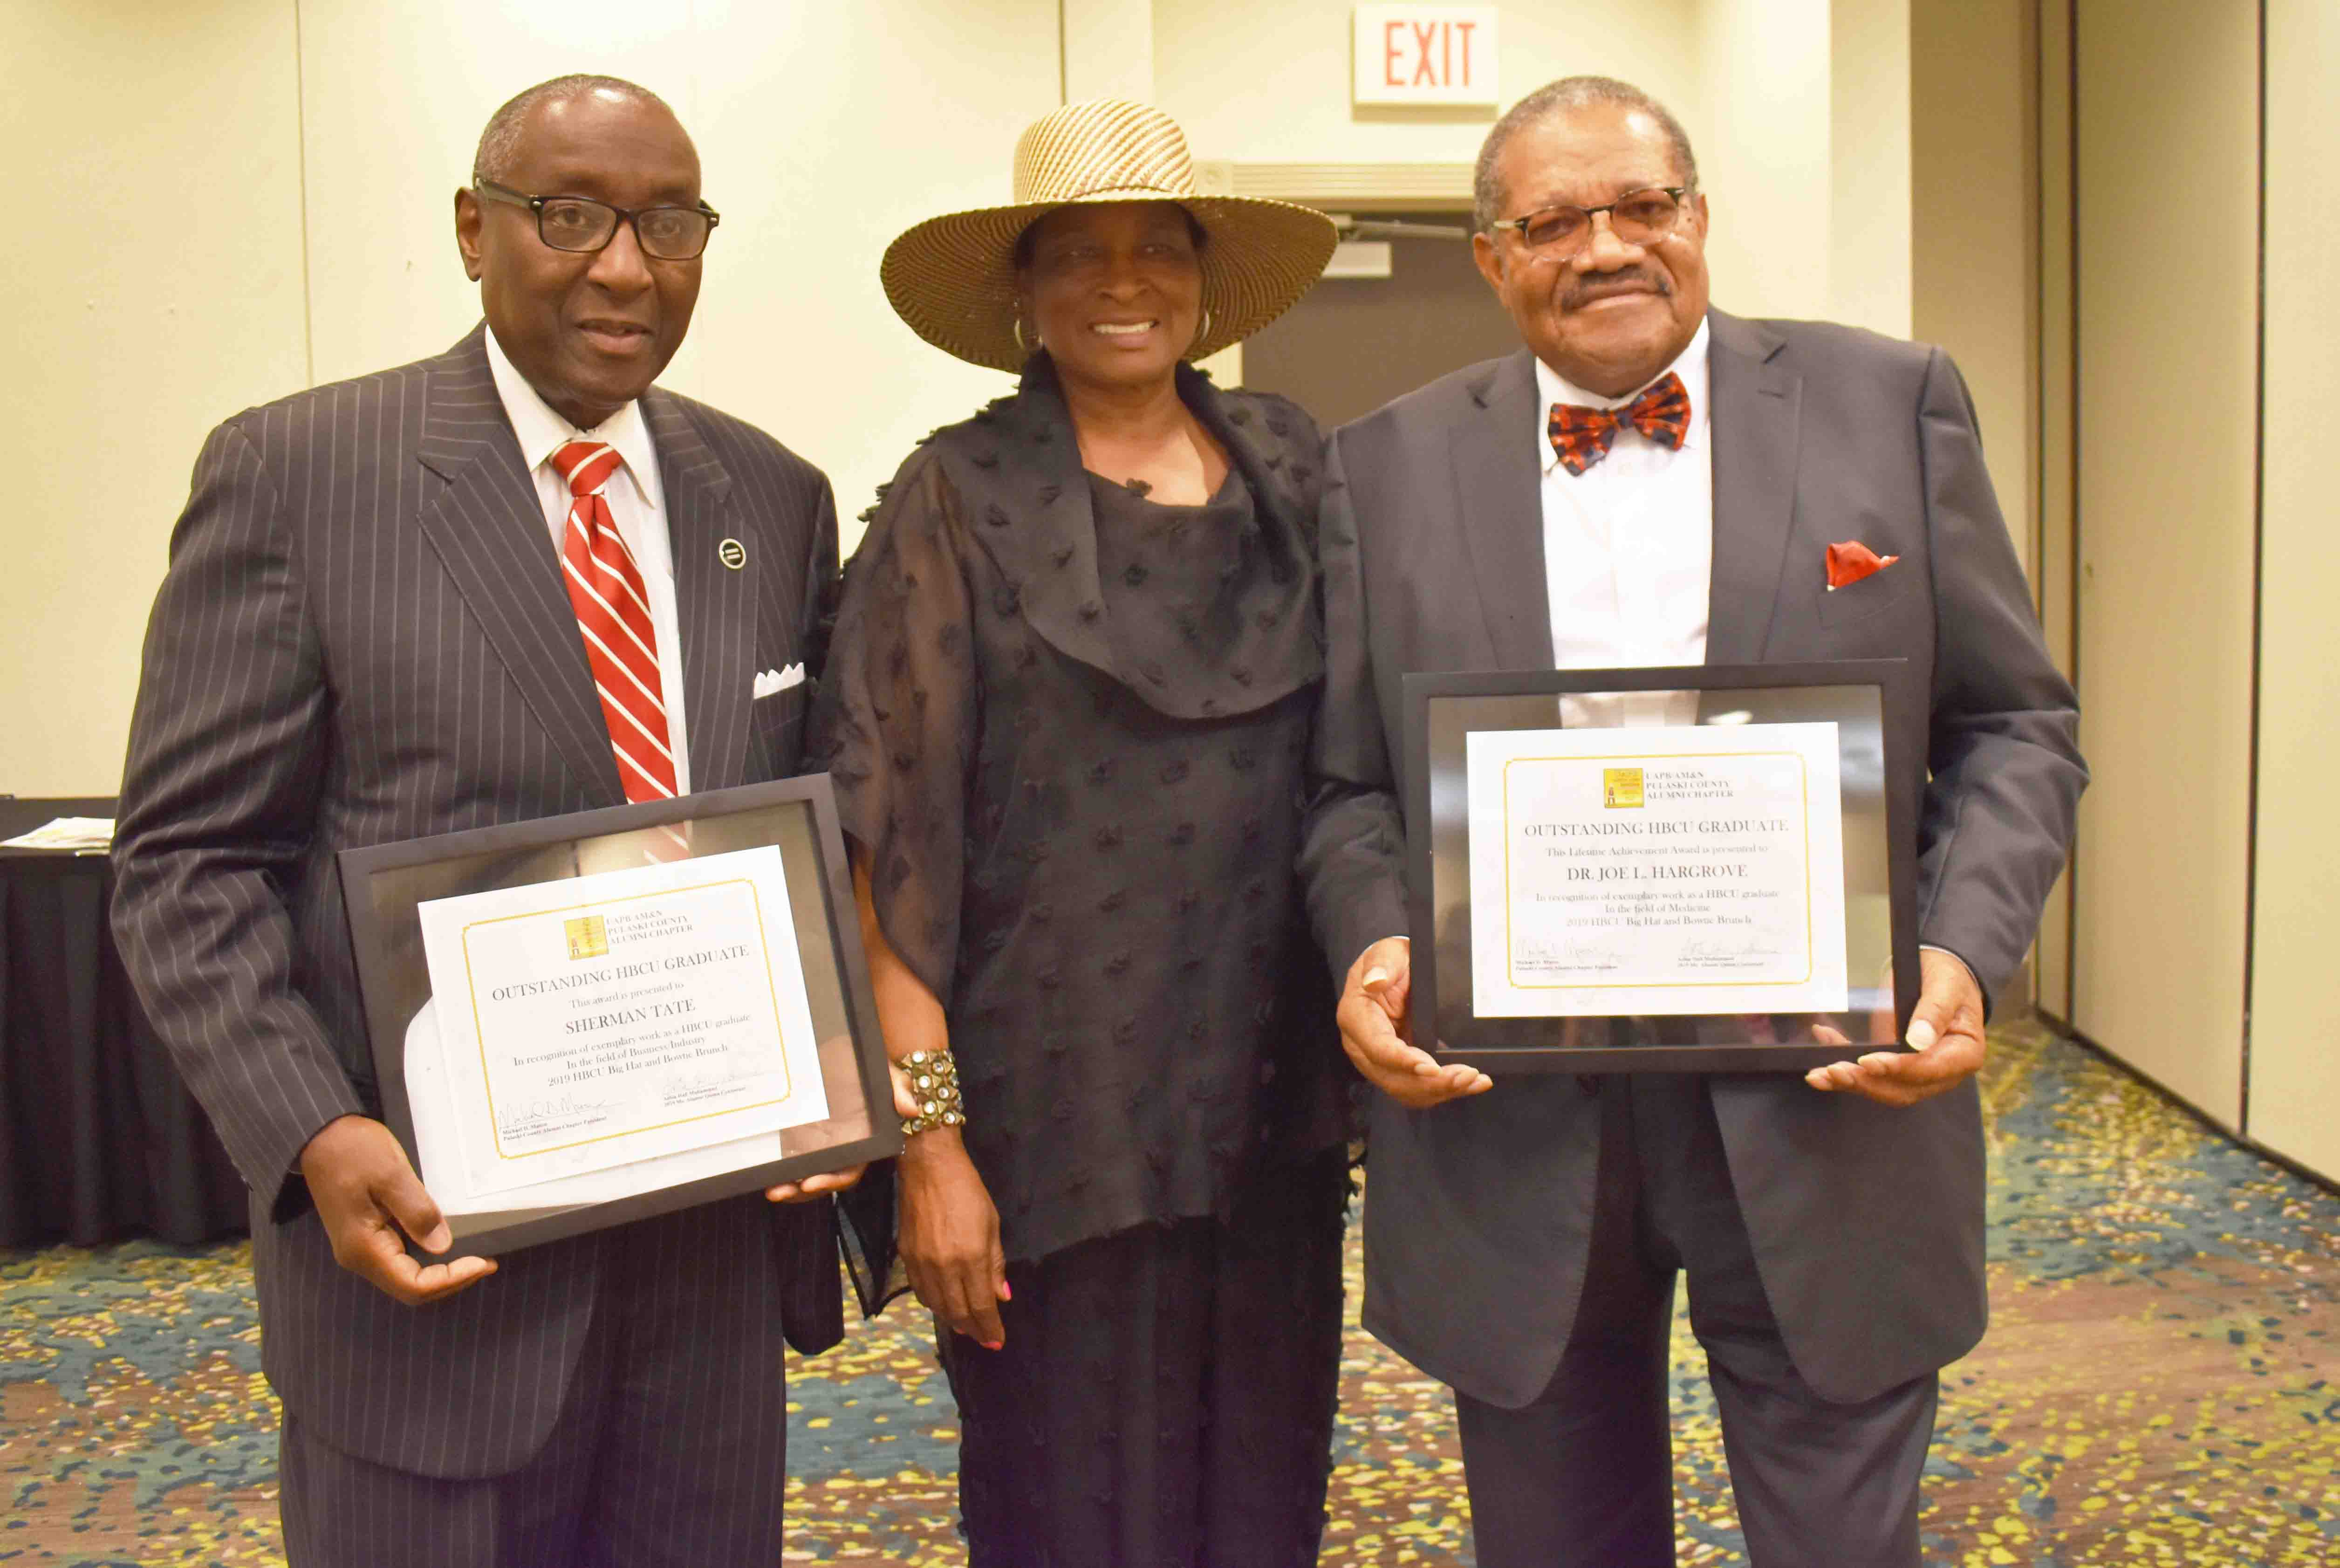 Sherman Tate, Pearl Howse, Dr. Joe Hargrove